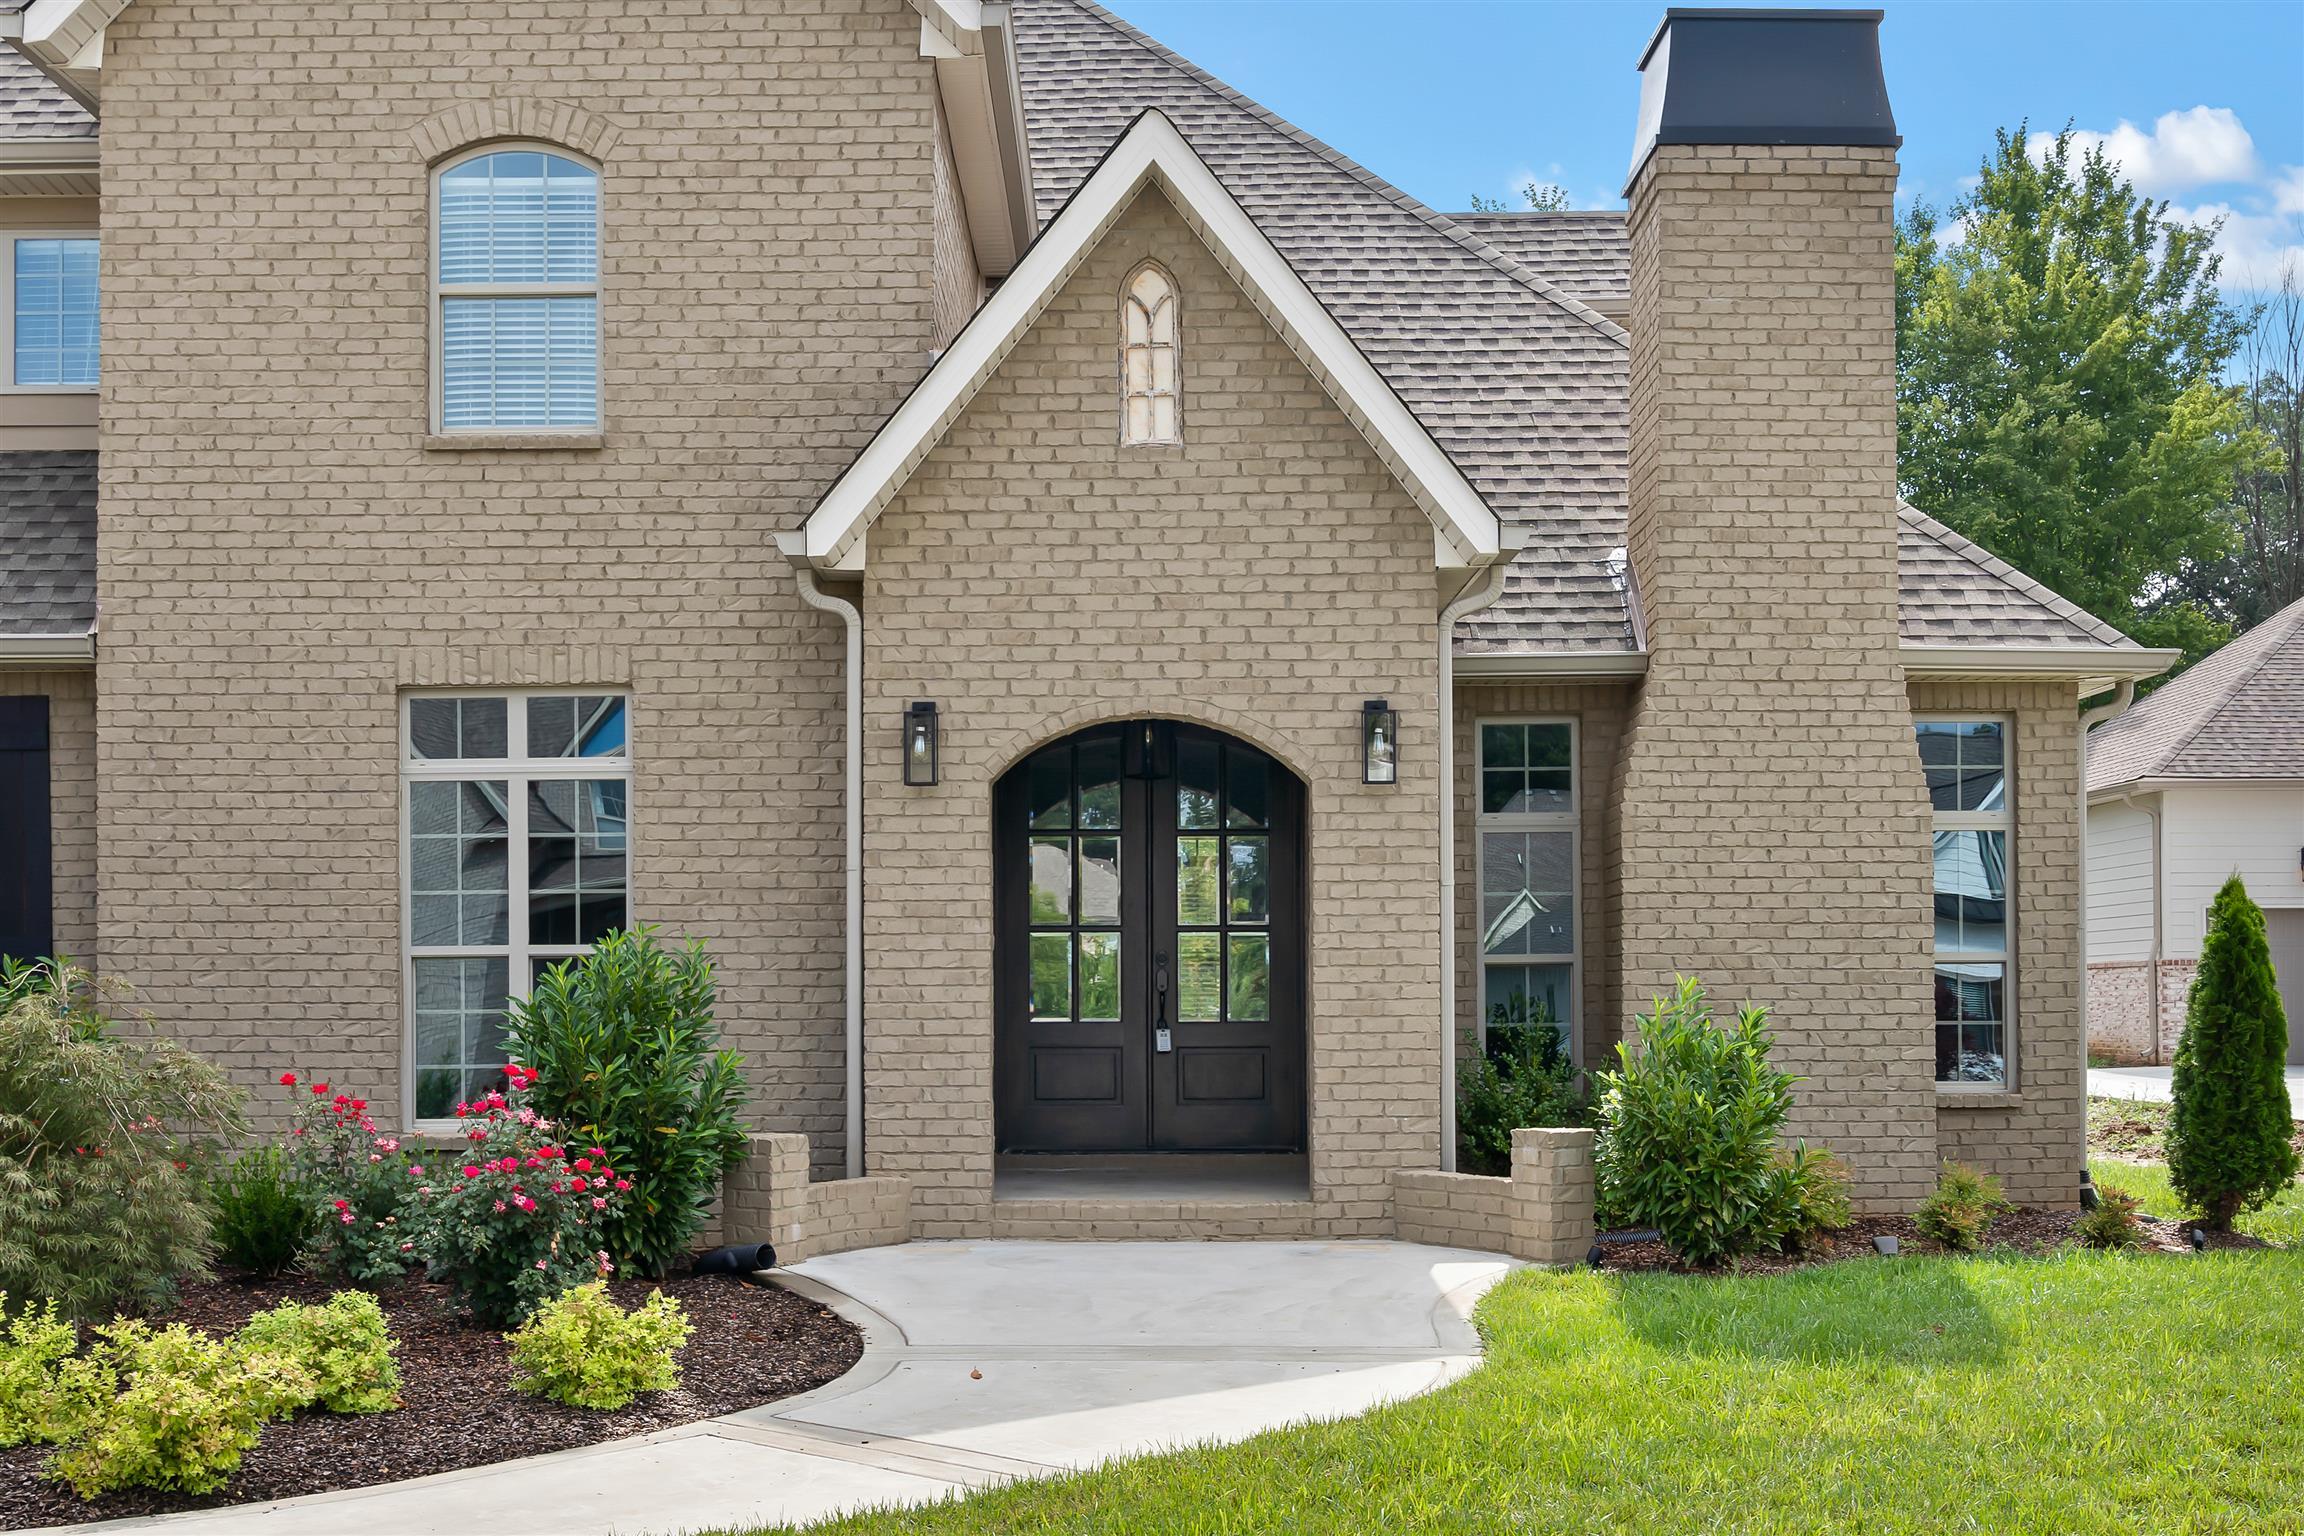 259 Harrowgate Dr, Clarksville, TN 37043 - Clarksville, TN real estate listing